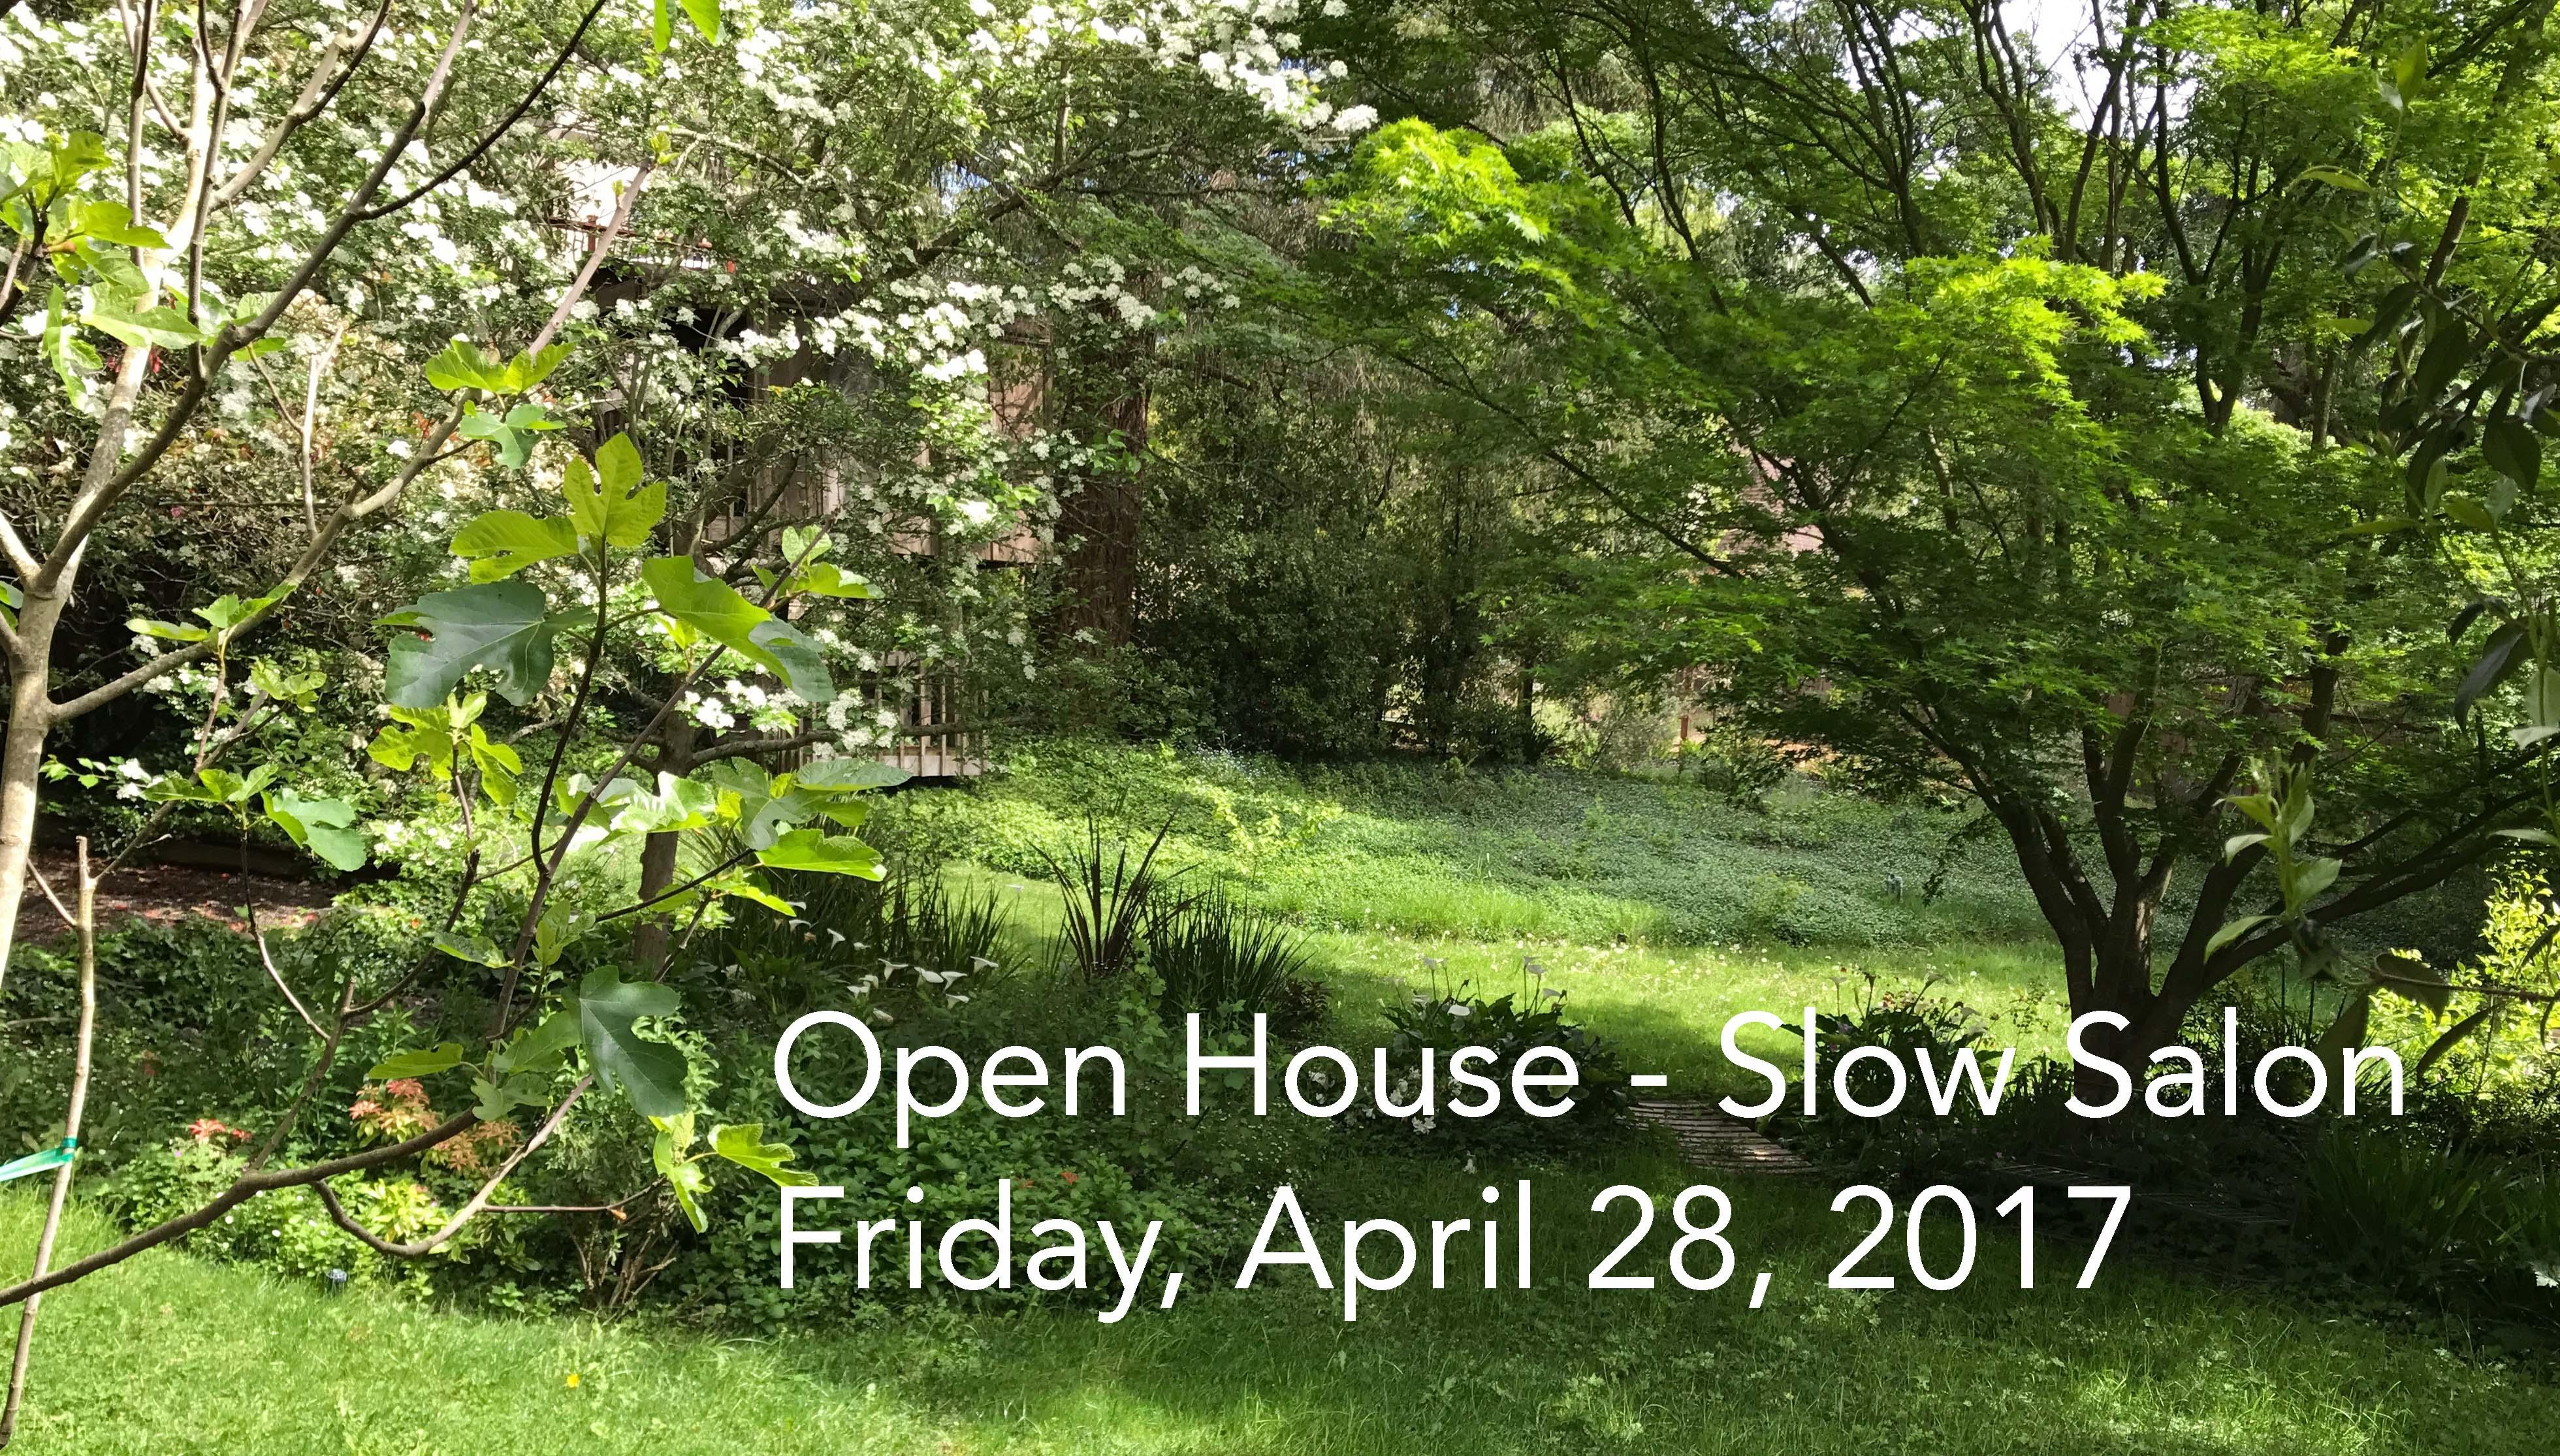 Open House — Slow Salon, Friday, April 28, 2017